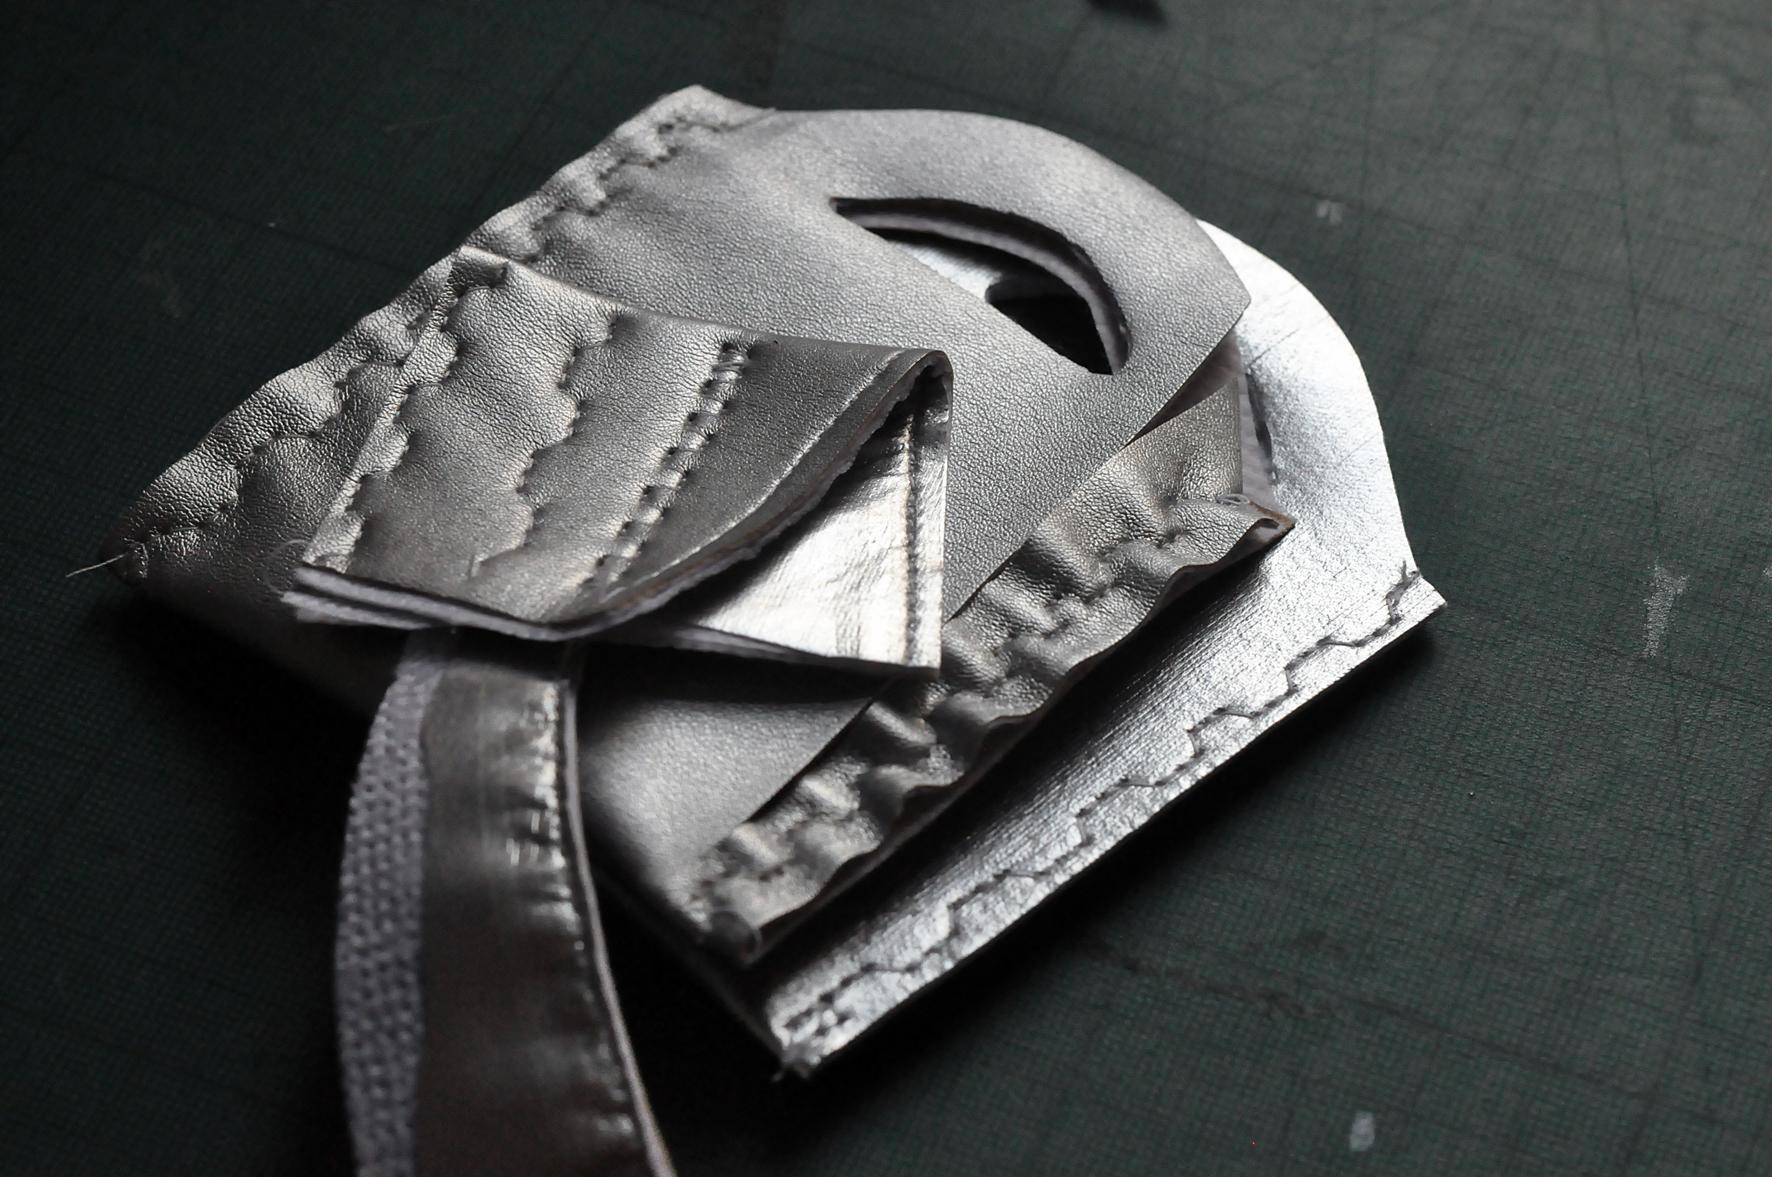 Stitch + Cut Tests. Snow Cool Bag. Dougie Scott